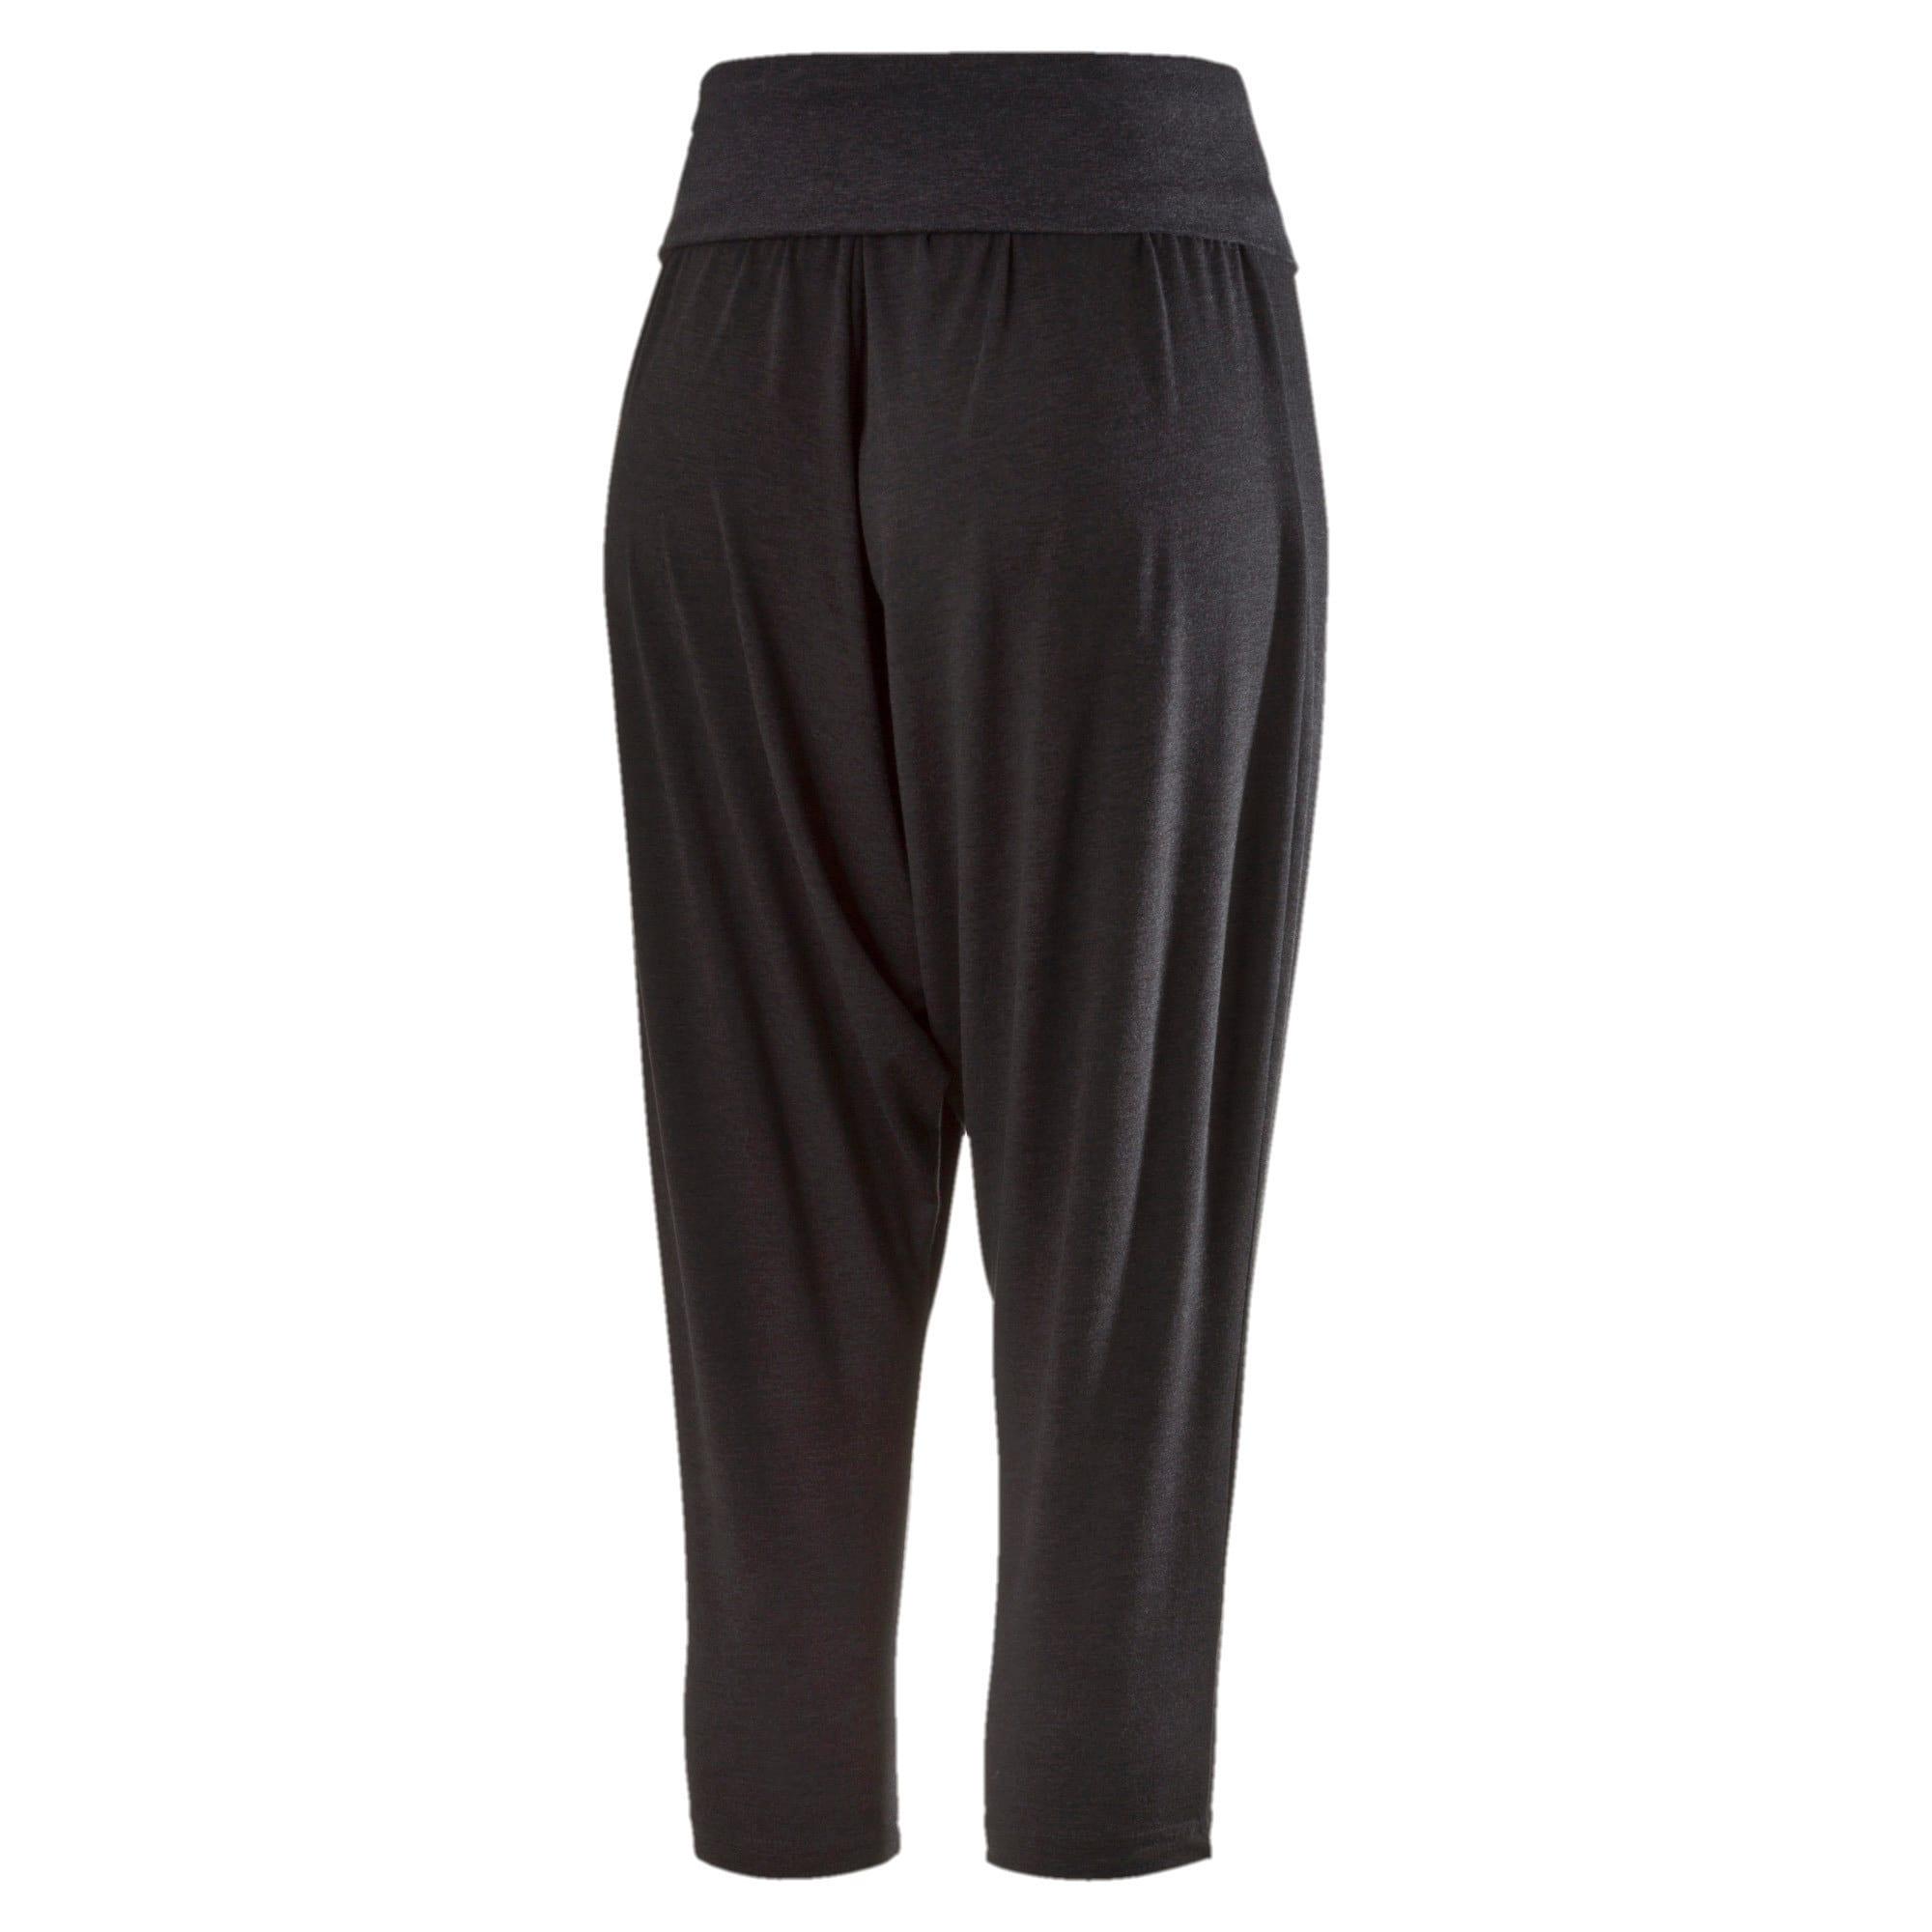 Thumbnail 4 of Active Training Women's Dancer Draped 3/4 Pants, dark gray heather, medium-IND